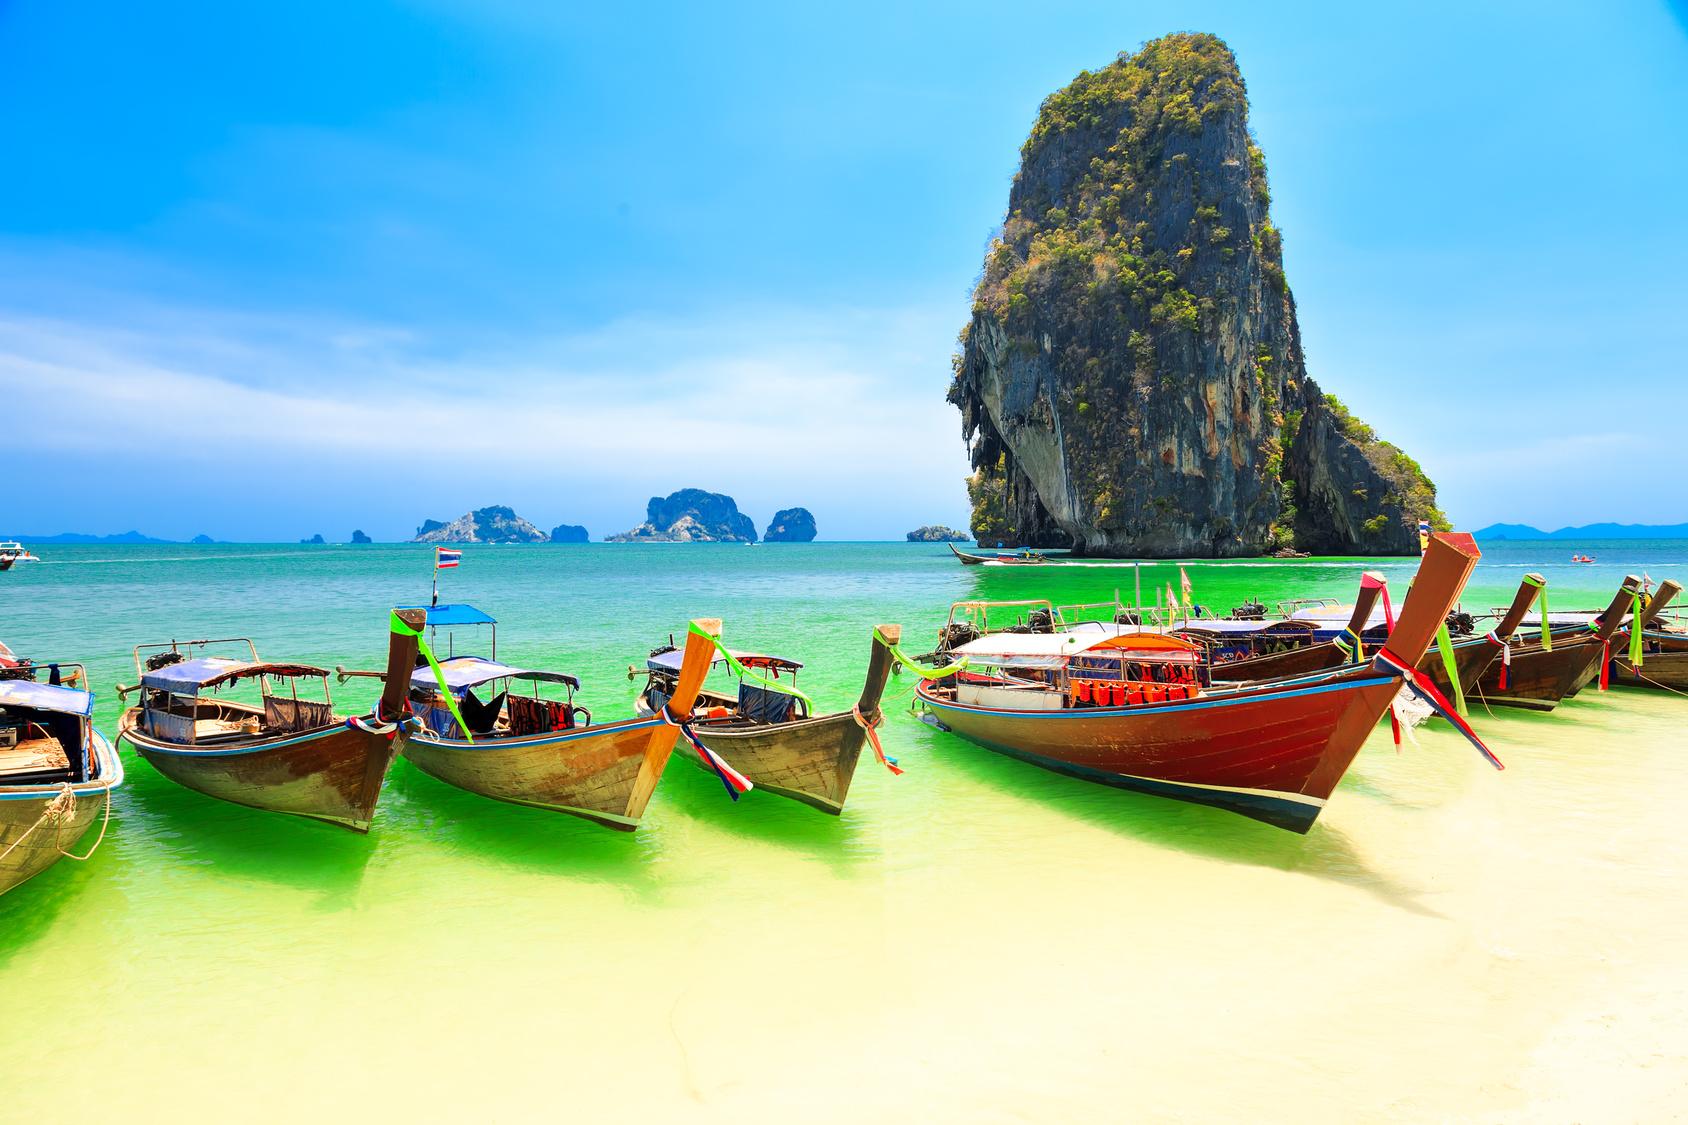 A világ legszebb strandjai - Railay Beach, Thaiföld